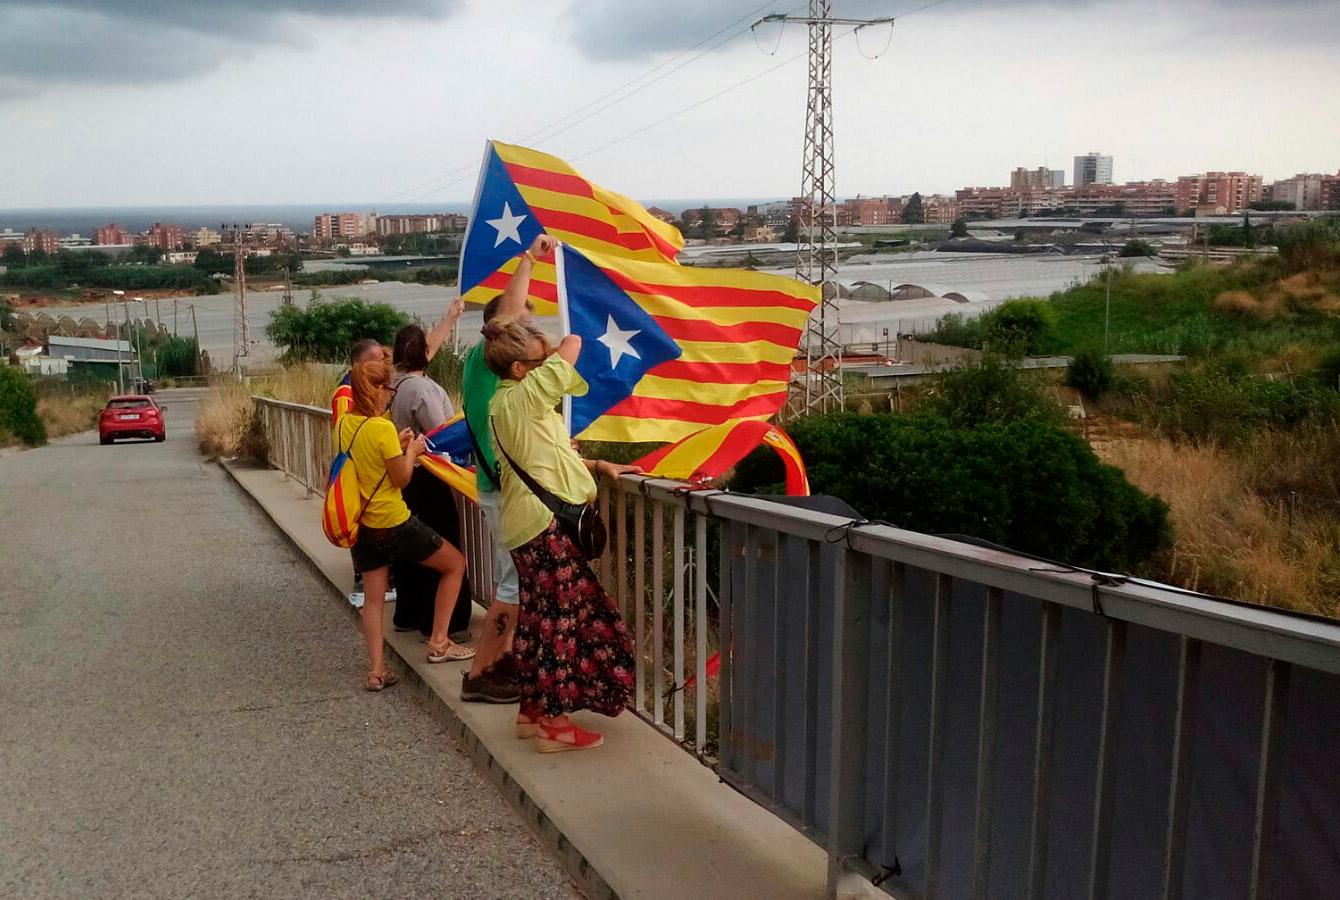 puente_ap7-separatistas24082018-02.jpeg